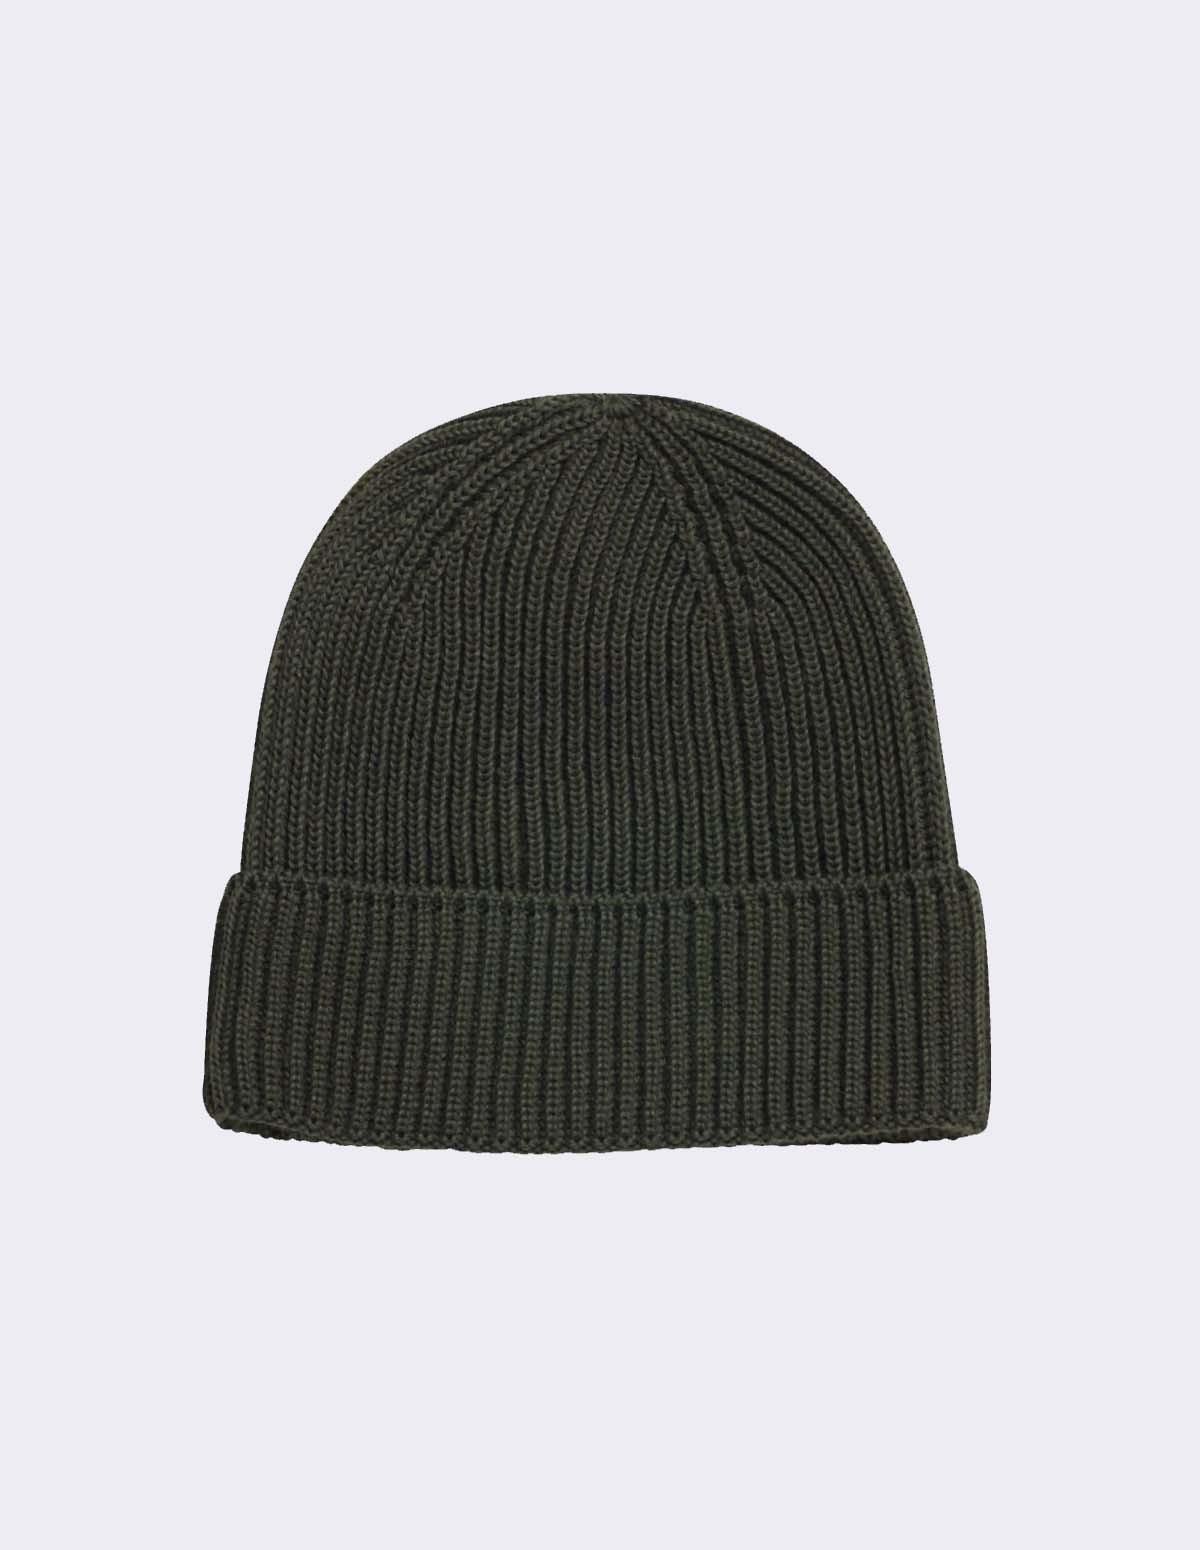 Sns Mental Hat - DEEP BRONZE GREEN